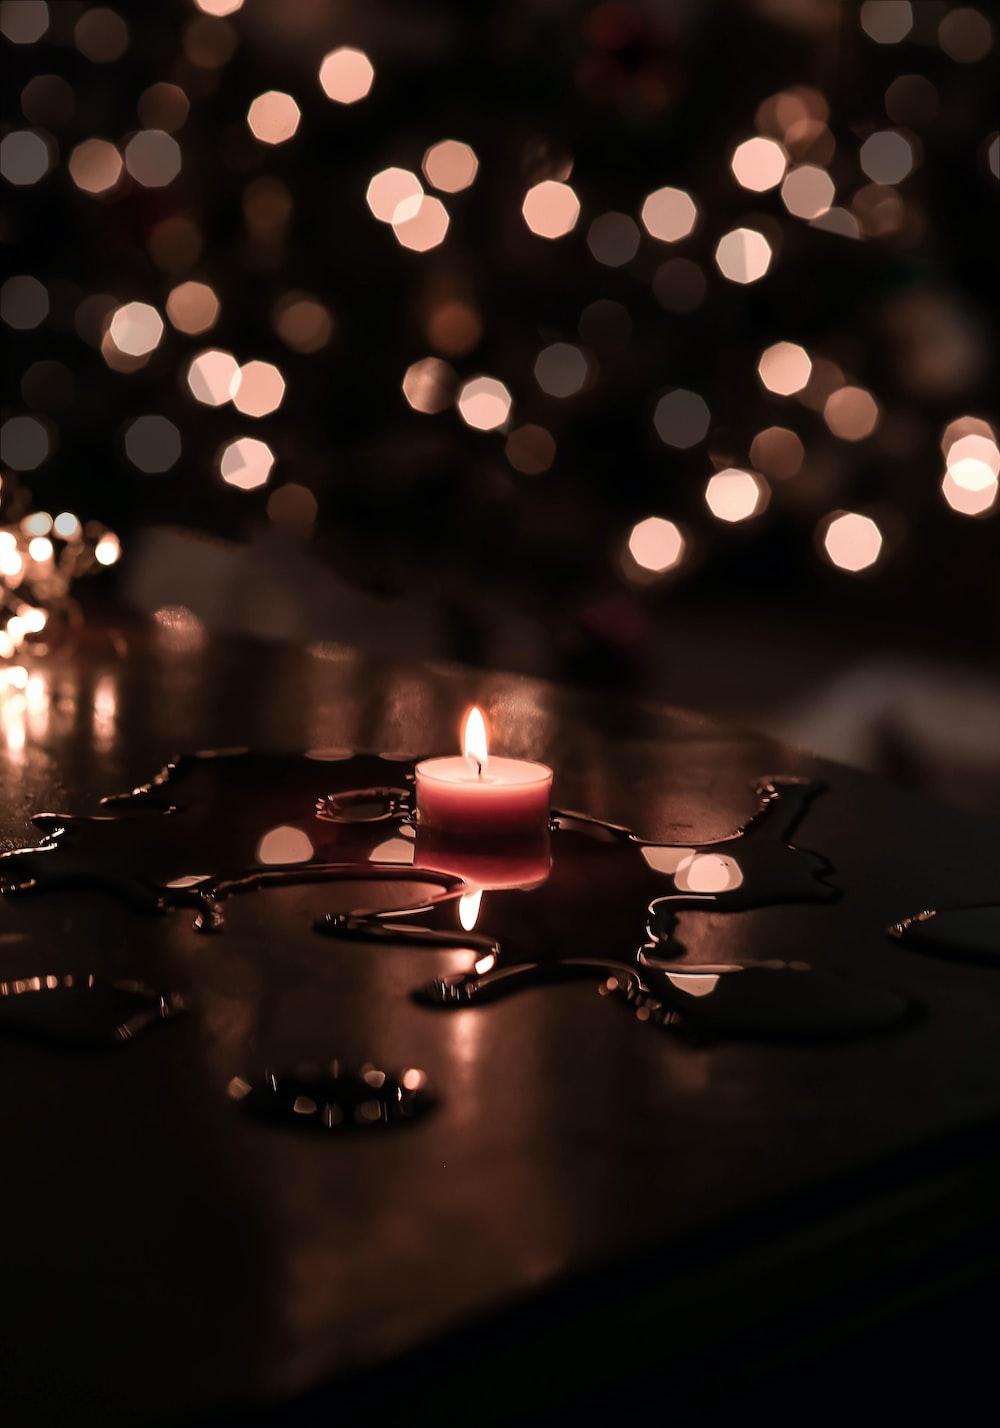 tilt shift lens photography of tealight candle